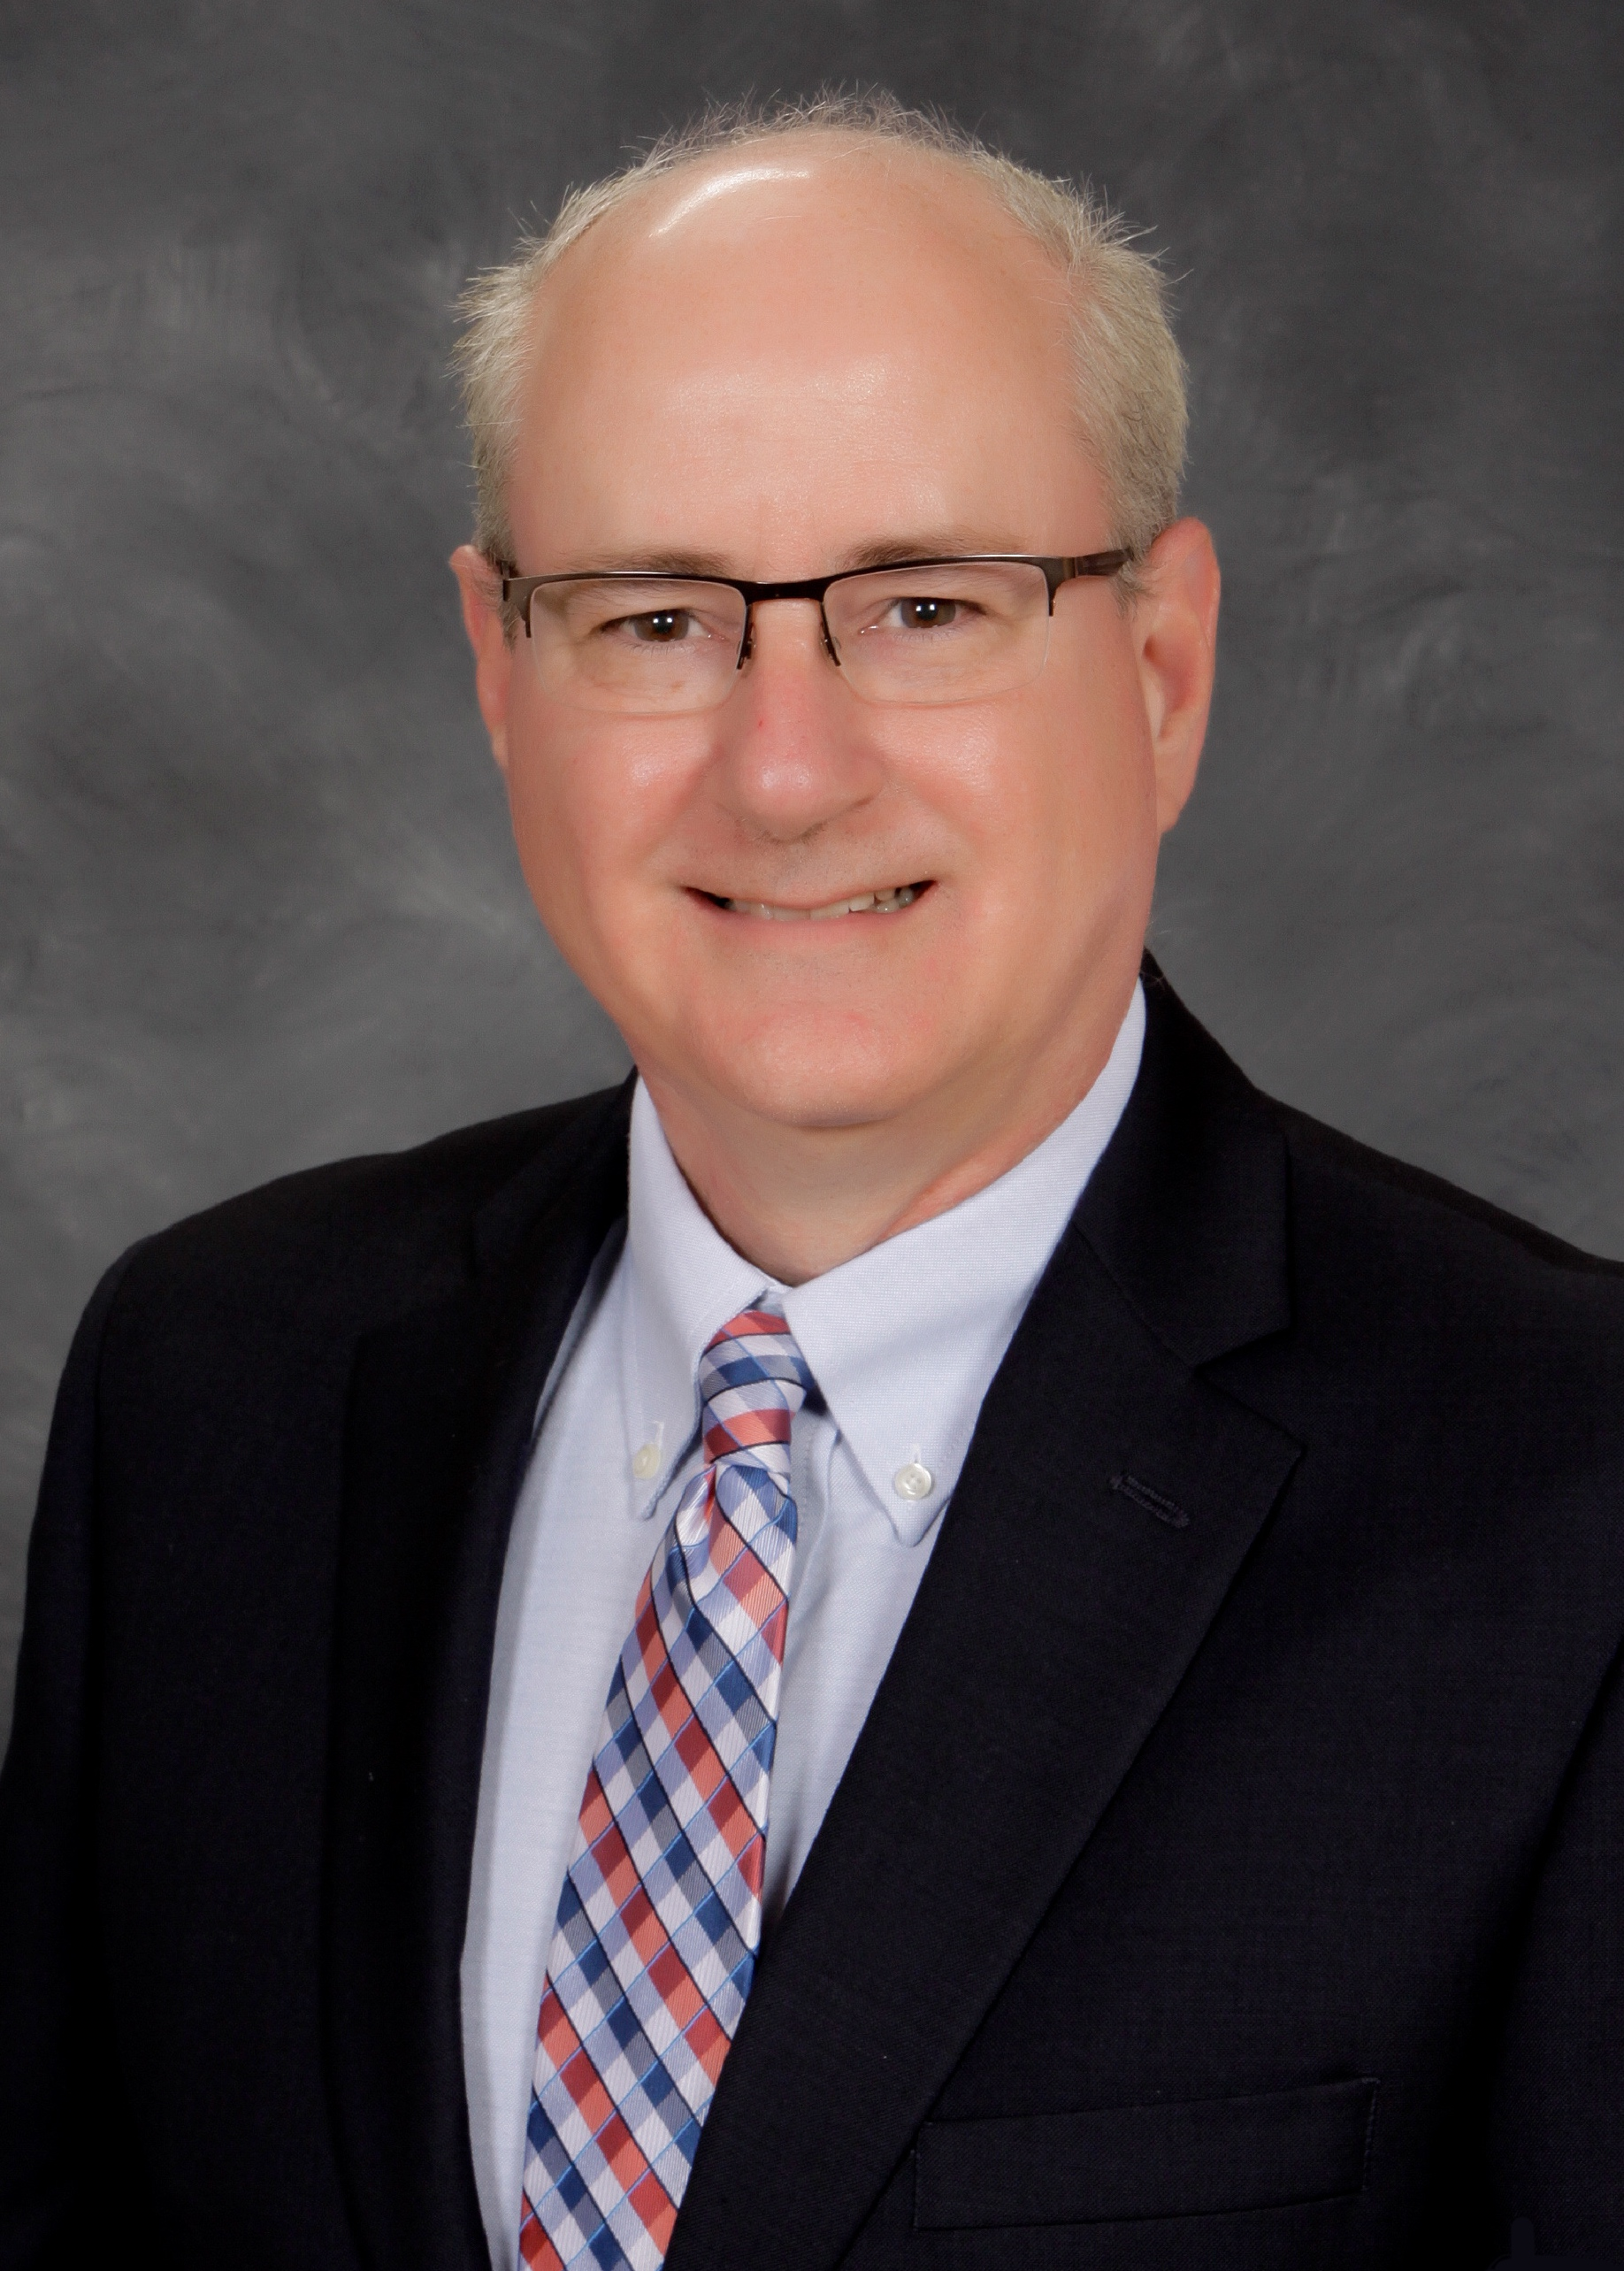 Dr. David E. Cranford, Senior Pastor